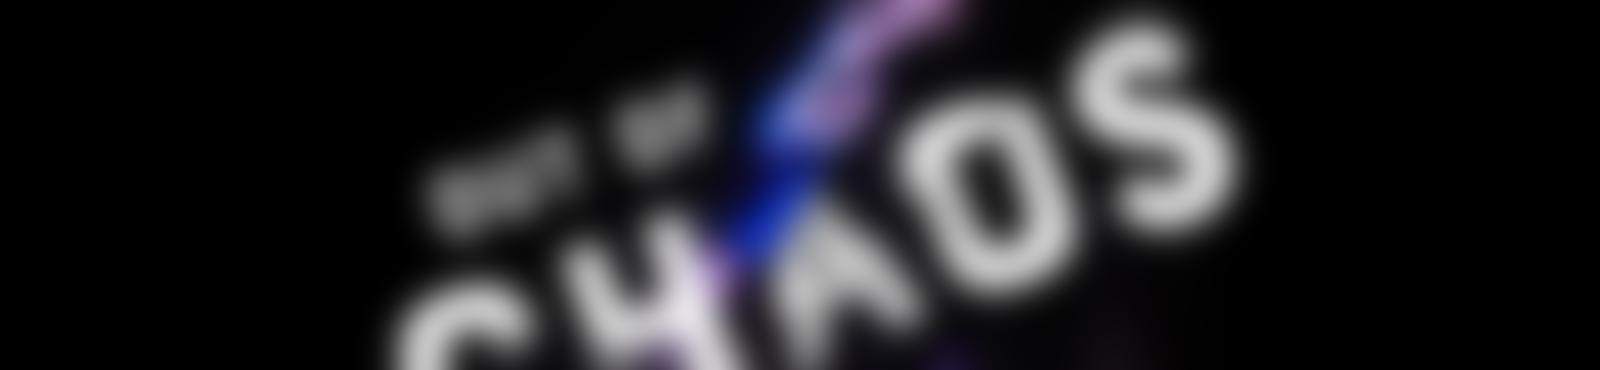 Blurred adf23143 82b1 4d1c 90ae f4df1d683593